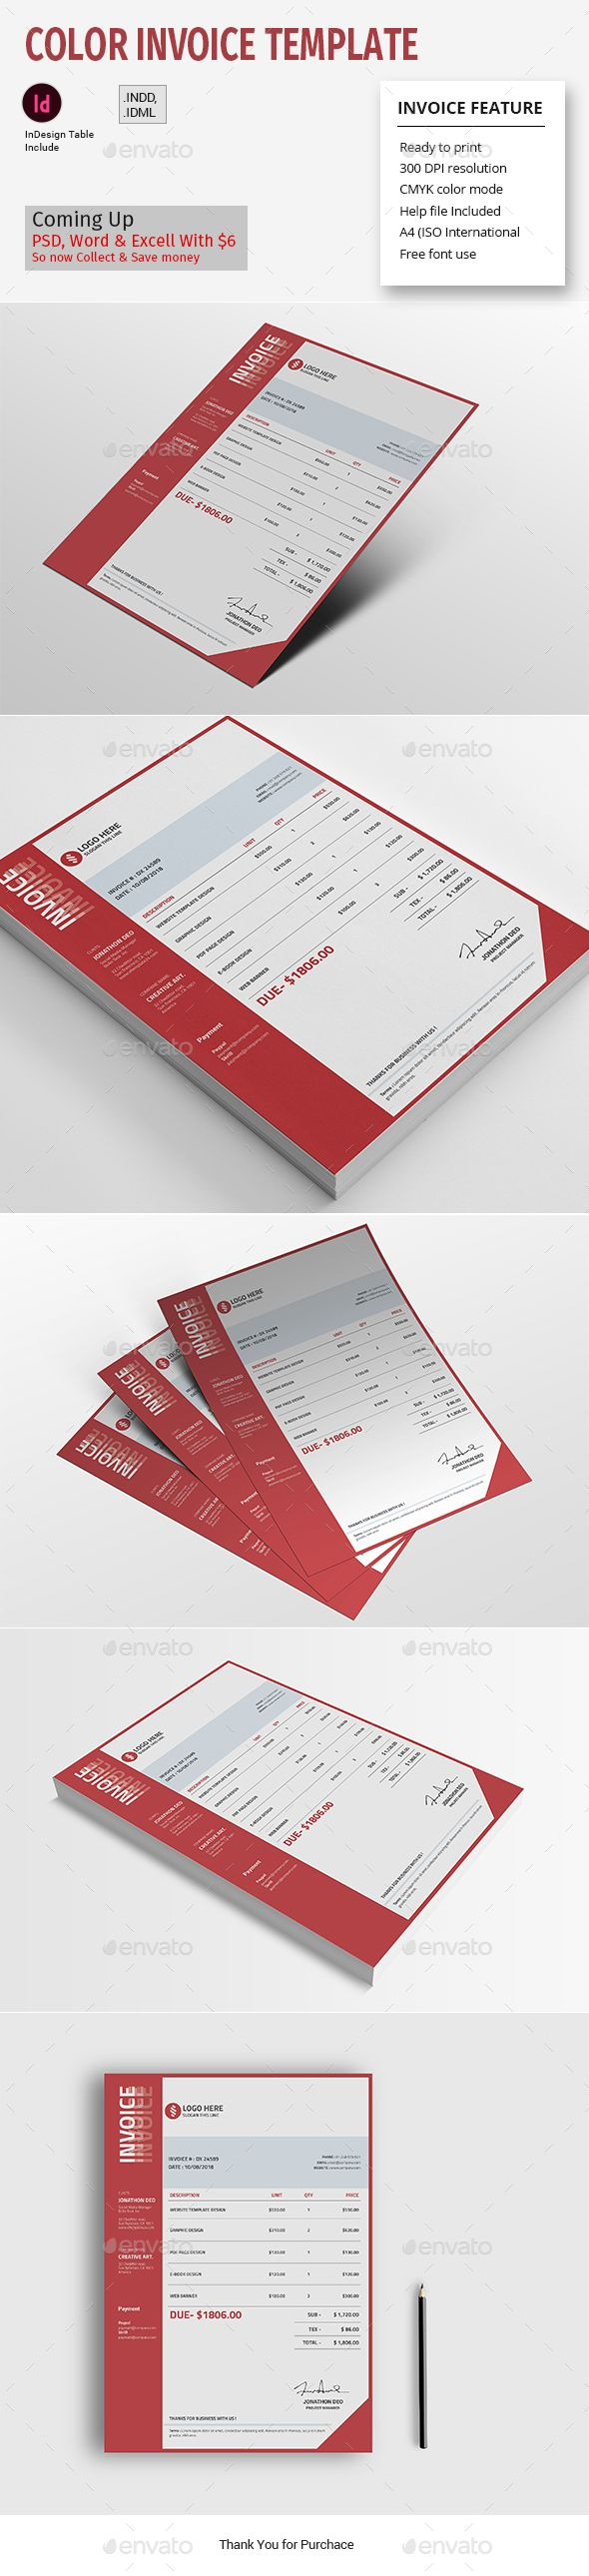 Color Invoice Template Invoice Template Invoice Design Stationery Templates